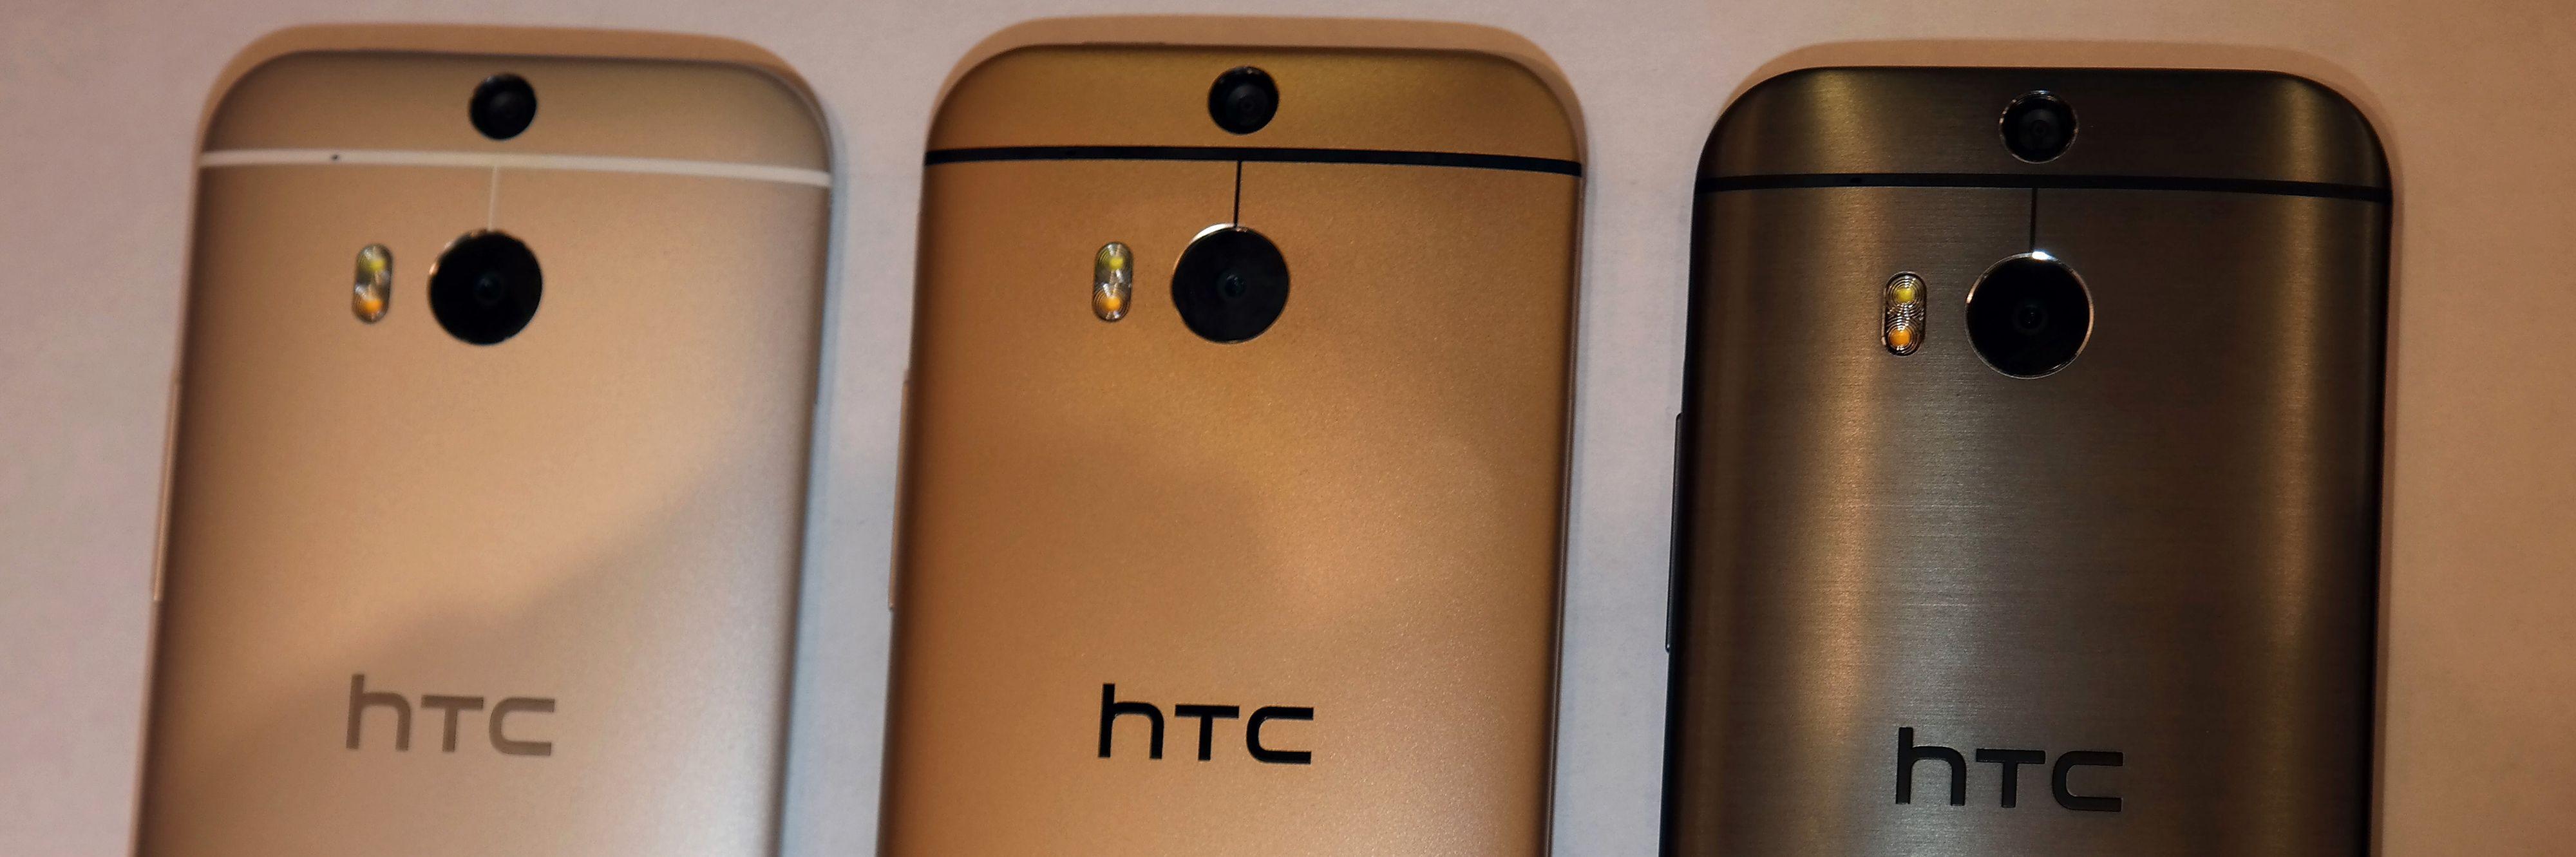 HTC One M8 kommer i tre farger.Foto: Espen Irwing Swang, Amobil.no